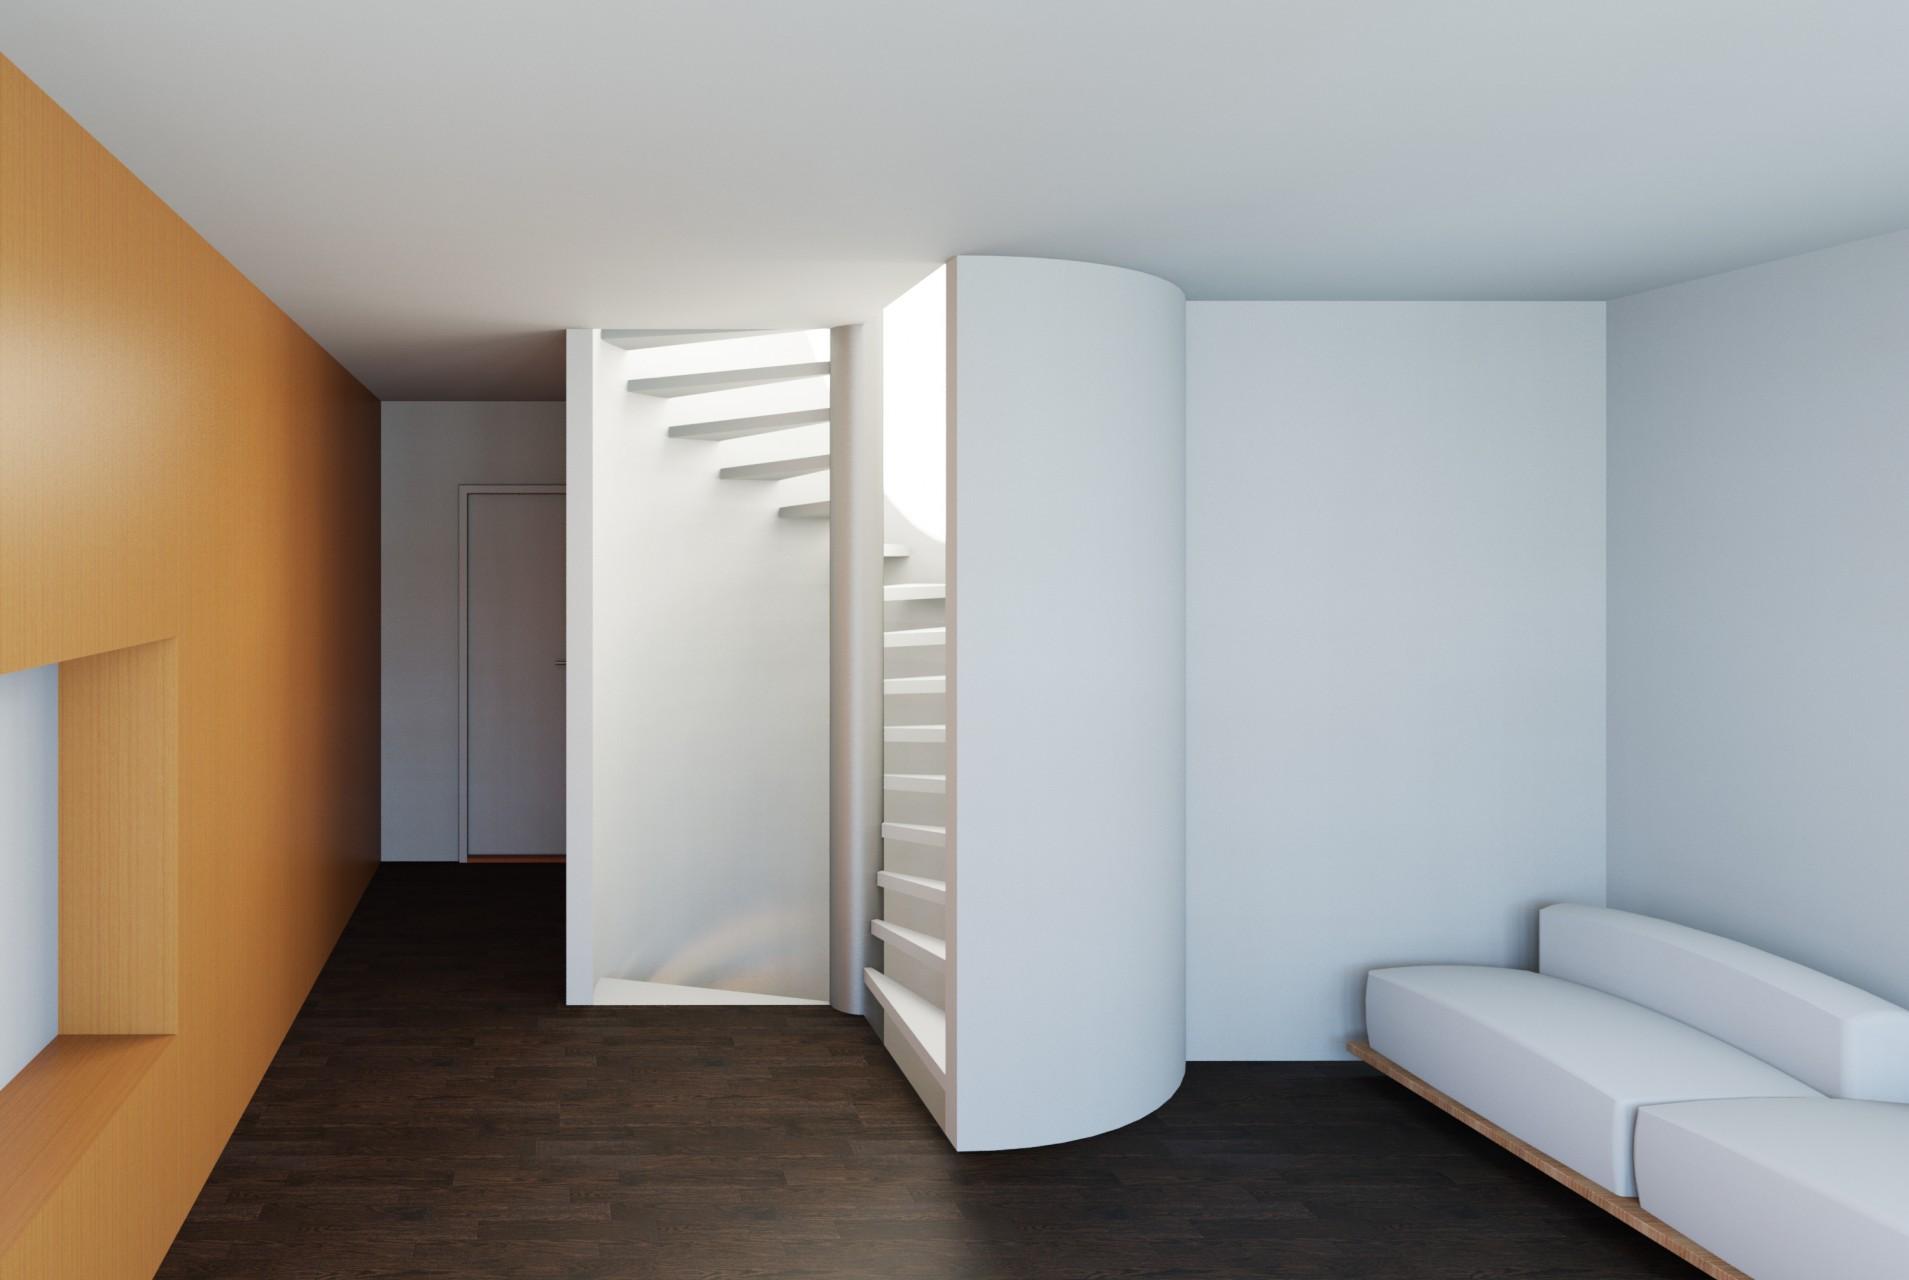 Interior living spate